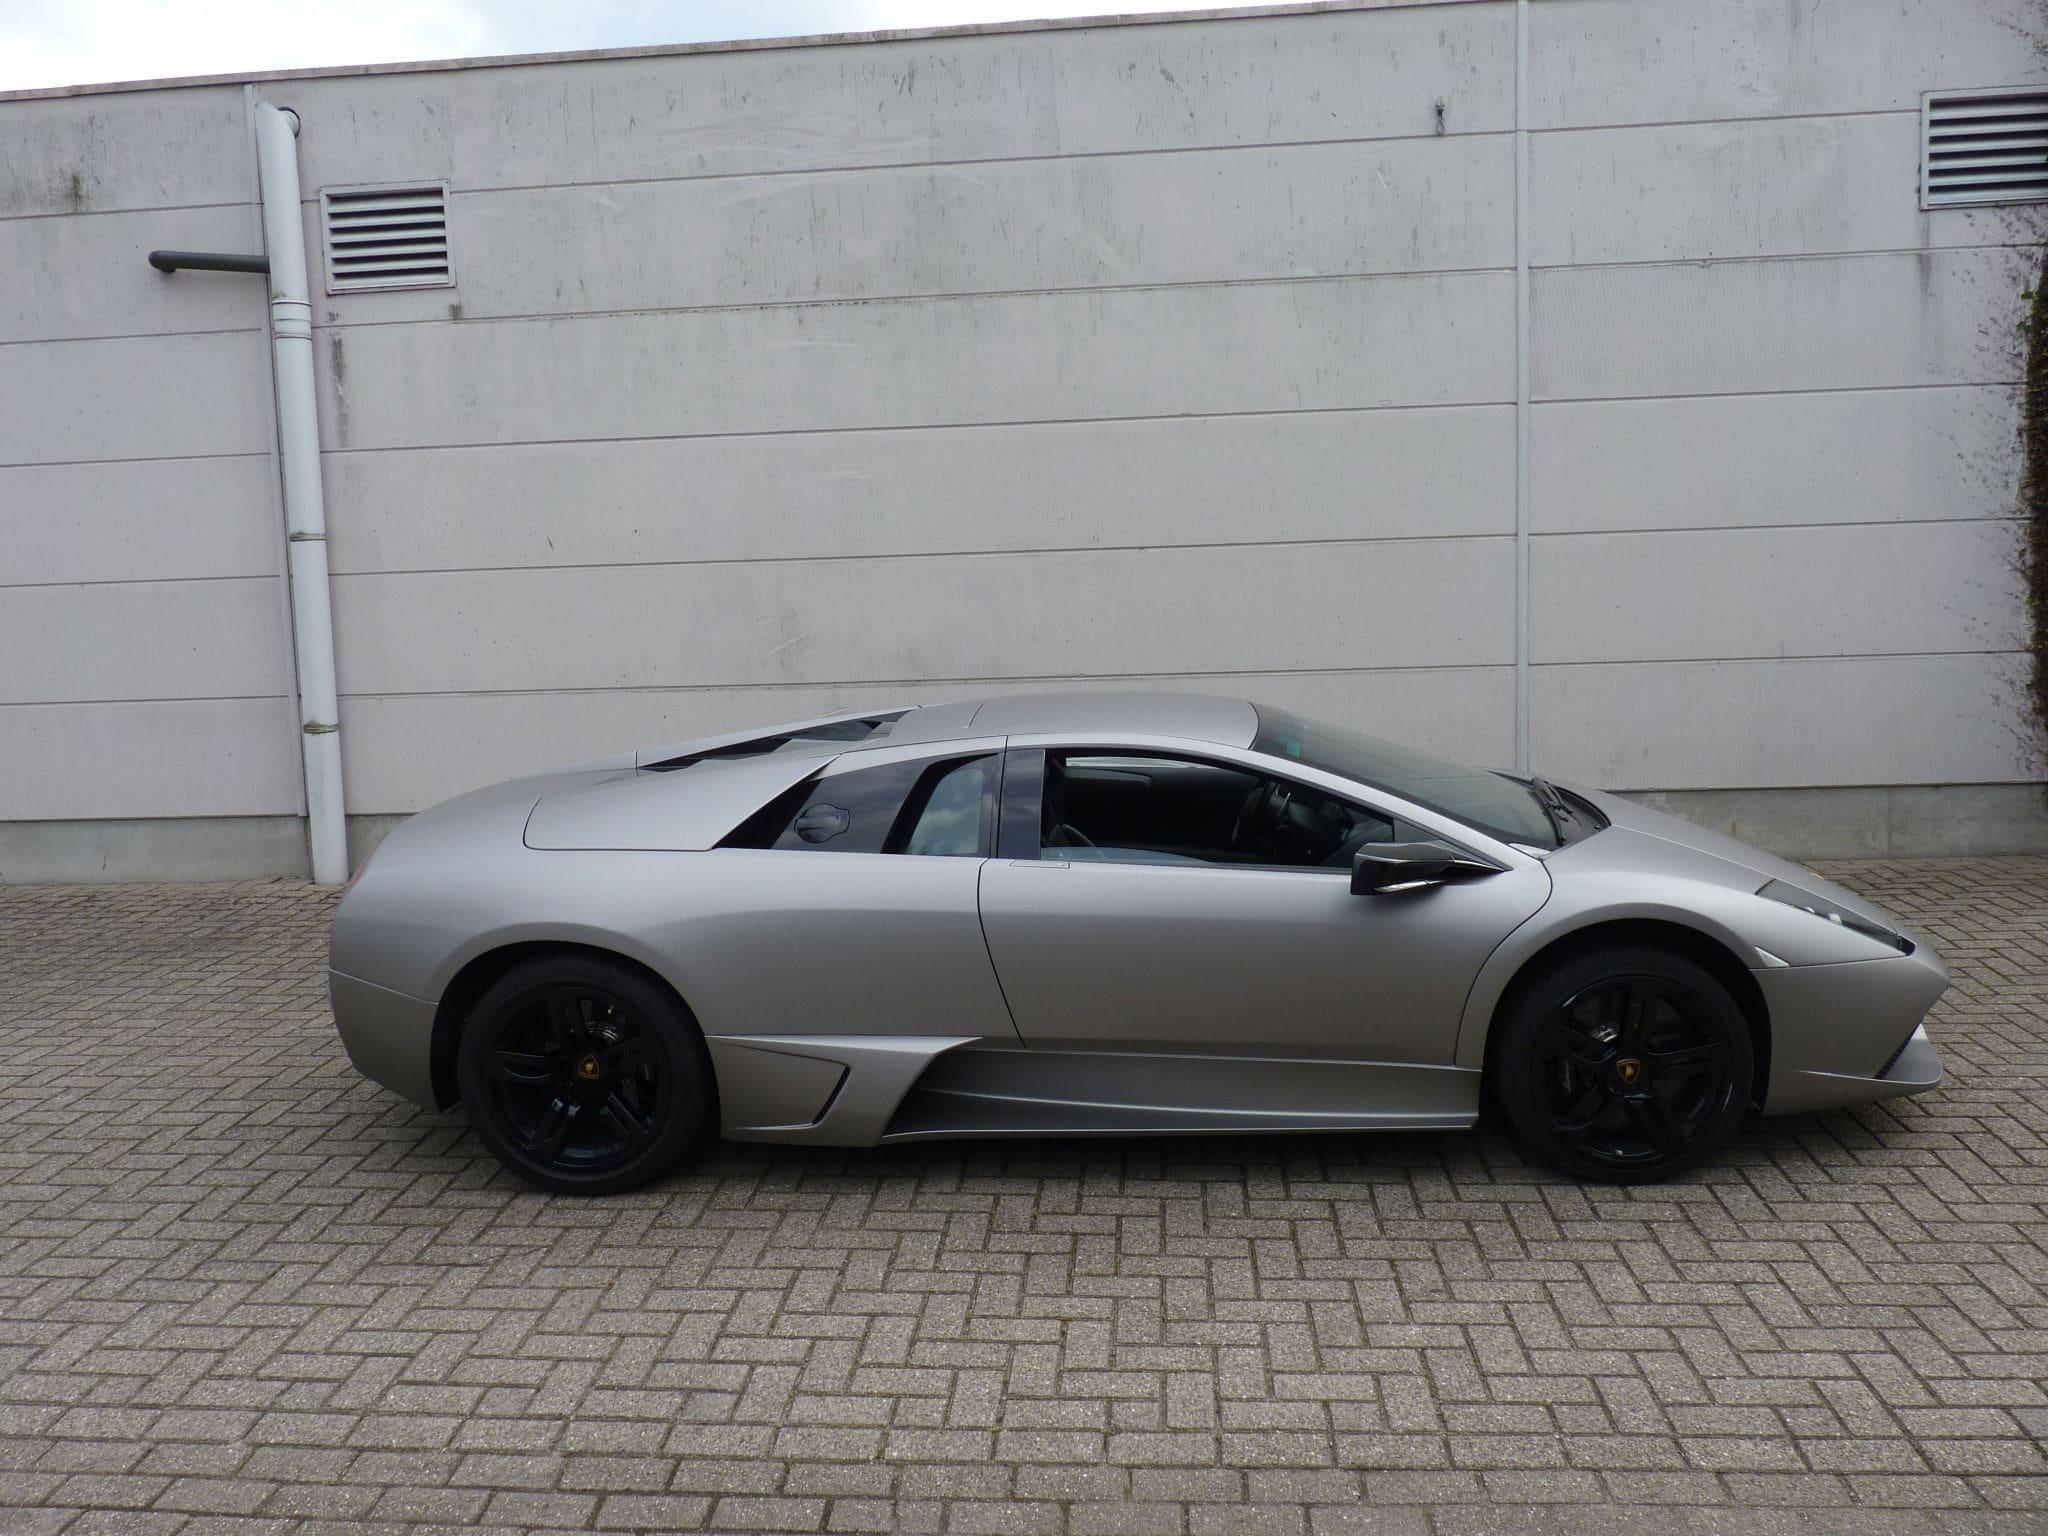 Lamborghini Murcialago LP670 met Gunpowder Wrap, Carwrapping door Wrapmyride.nu Foto-nr:5994, ©2021